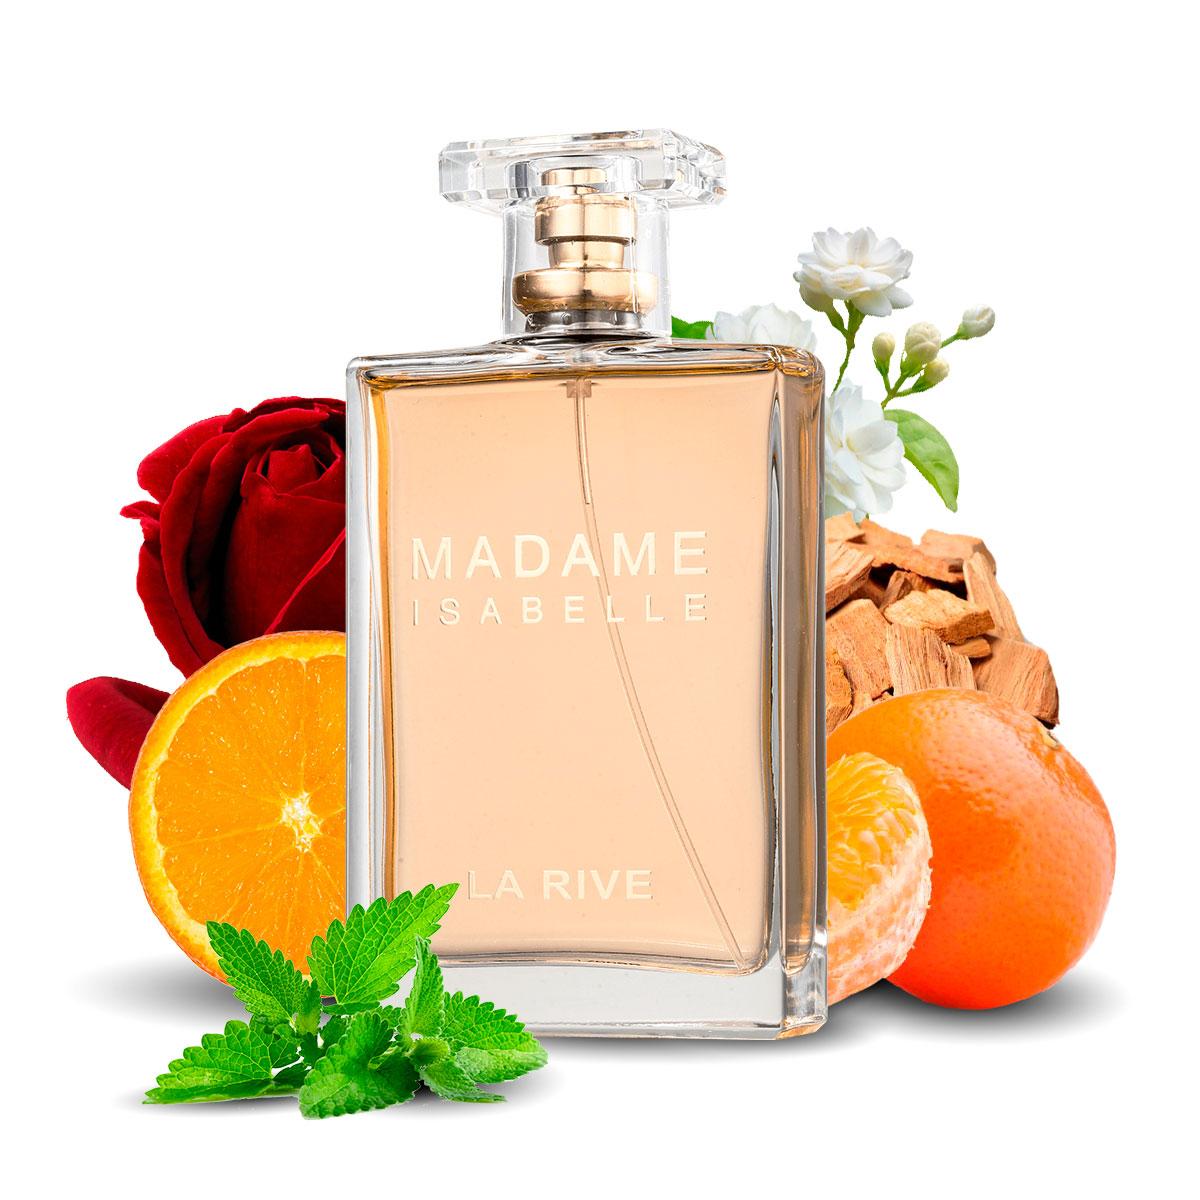 Kit 2 Perfumes Importados Extreme e Madame Isabelle La Rive